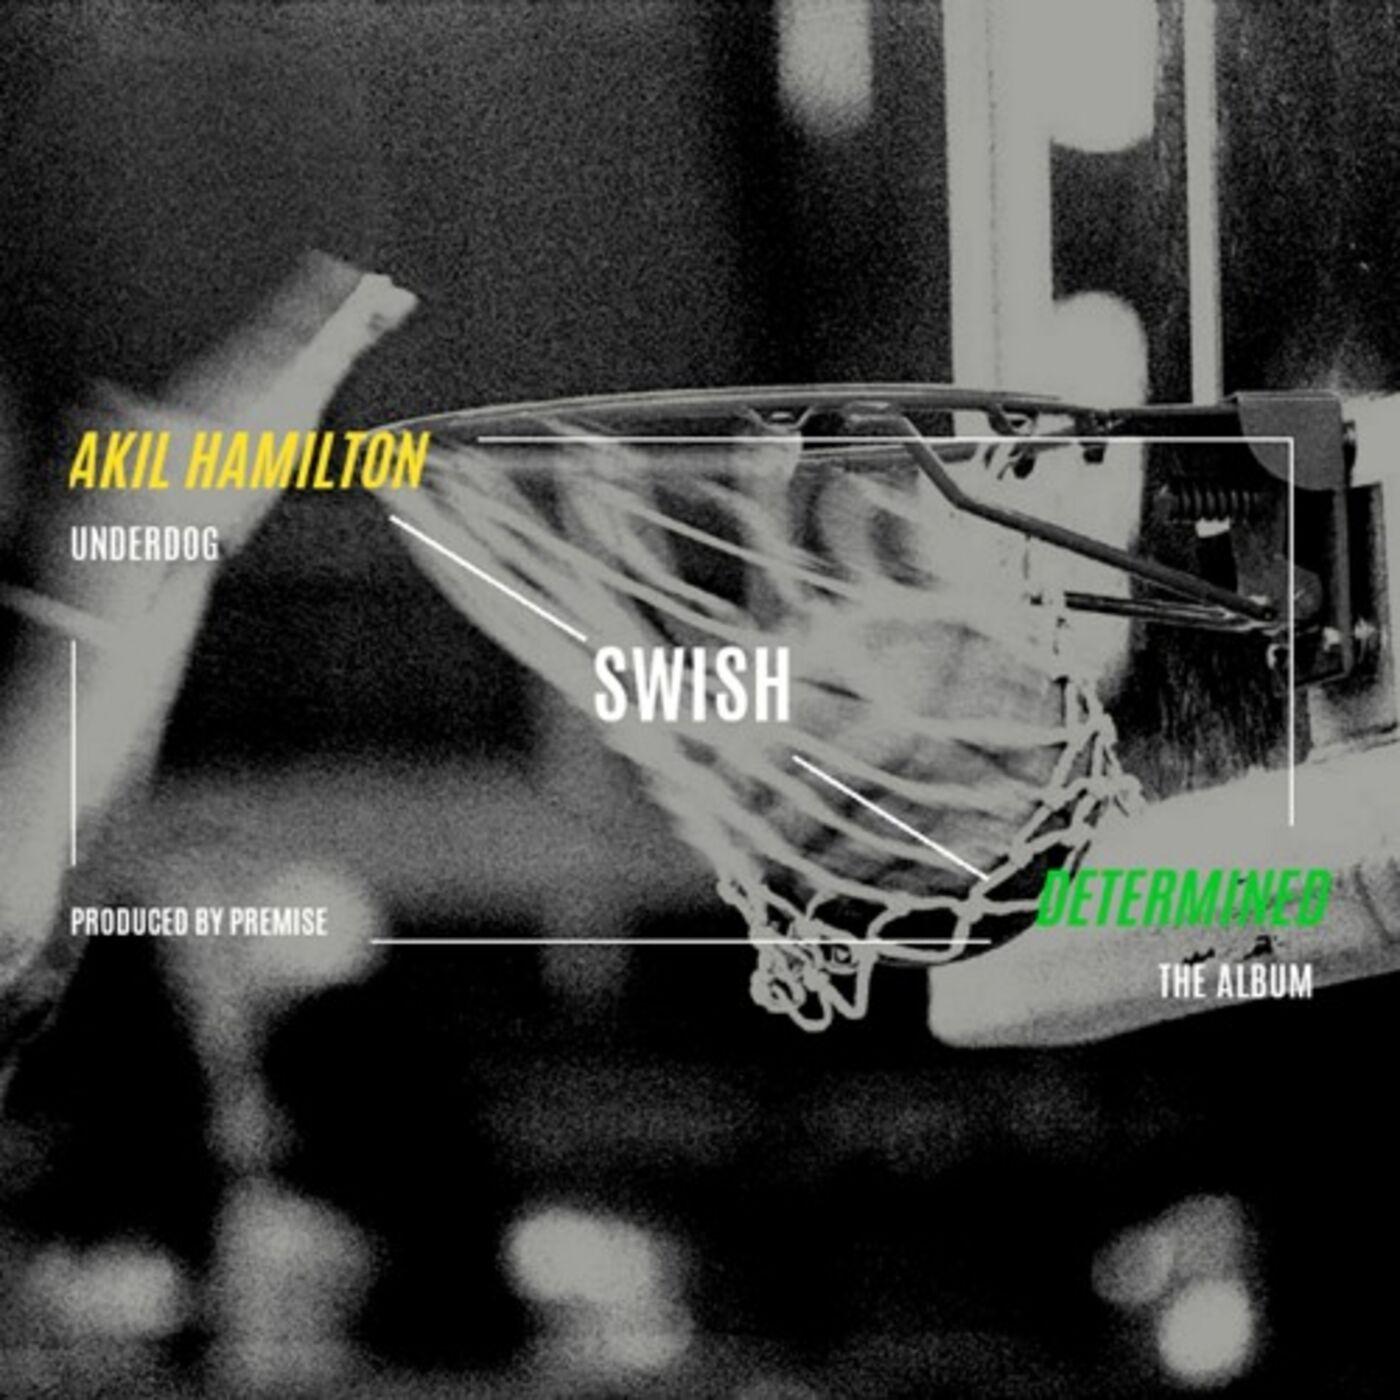 Swish - Akil Hamilton